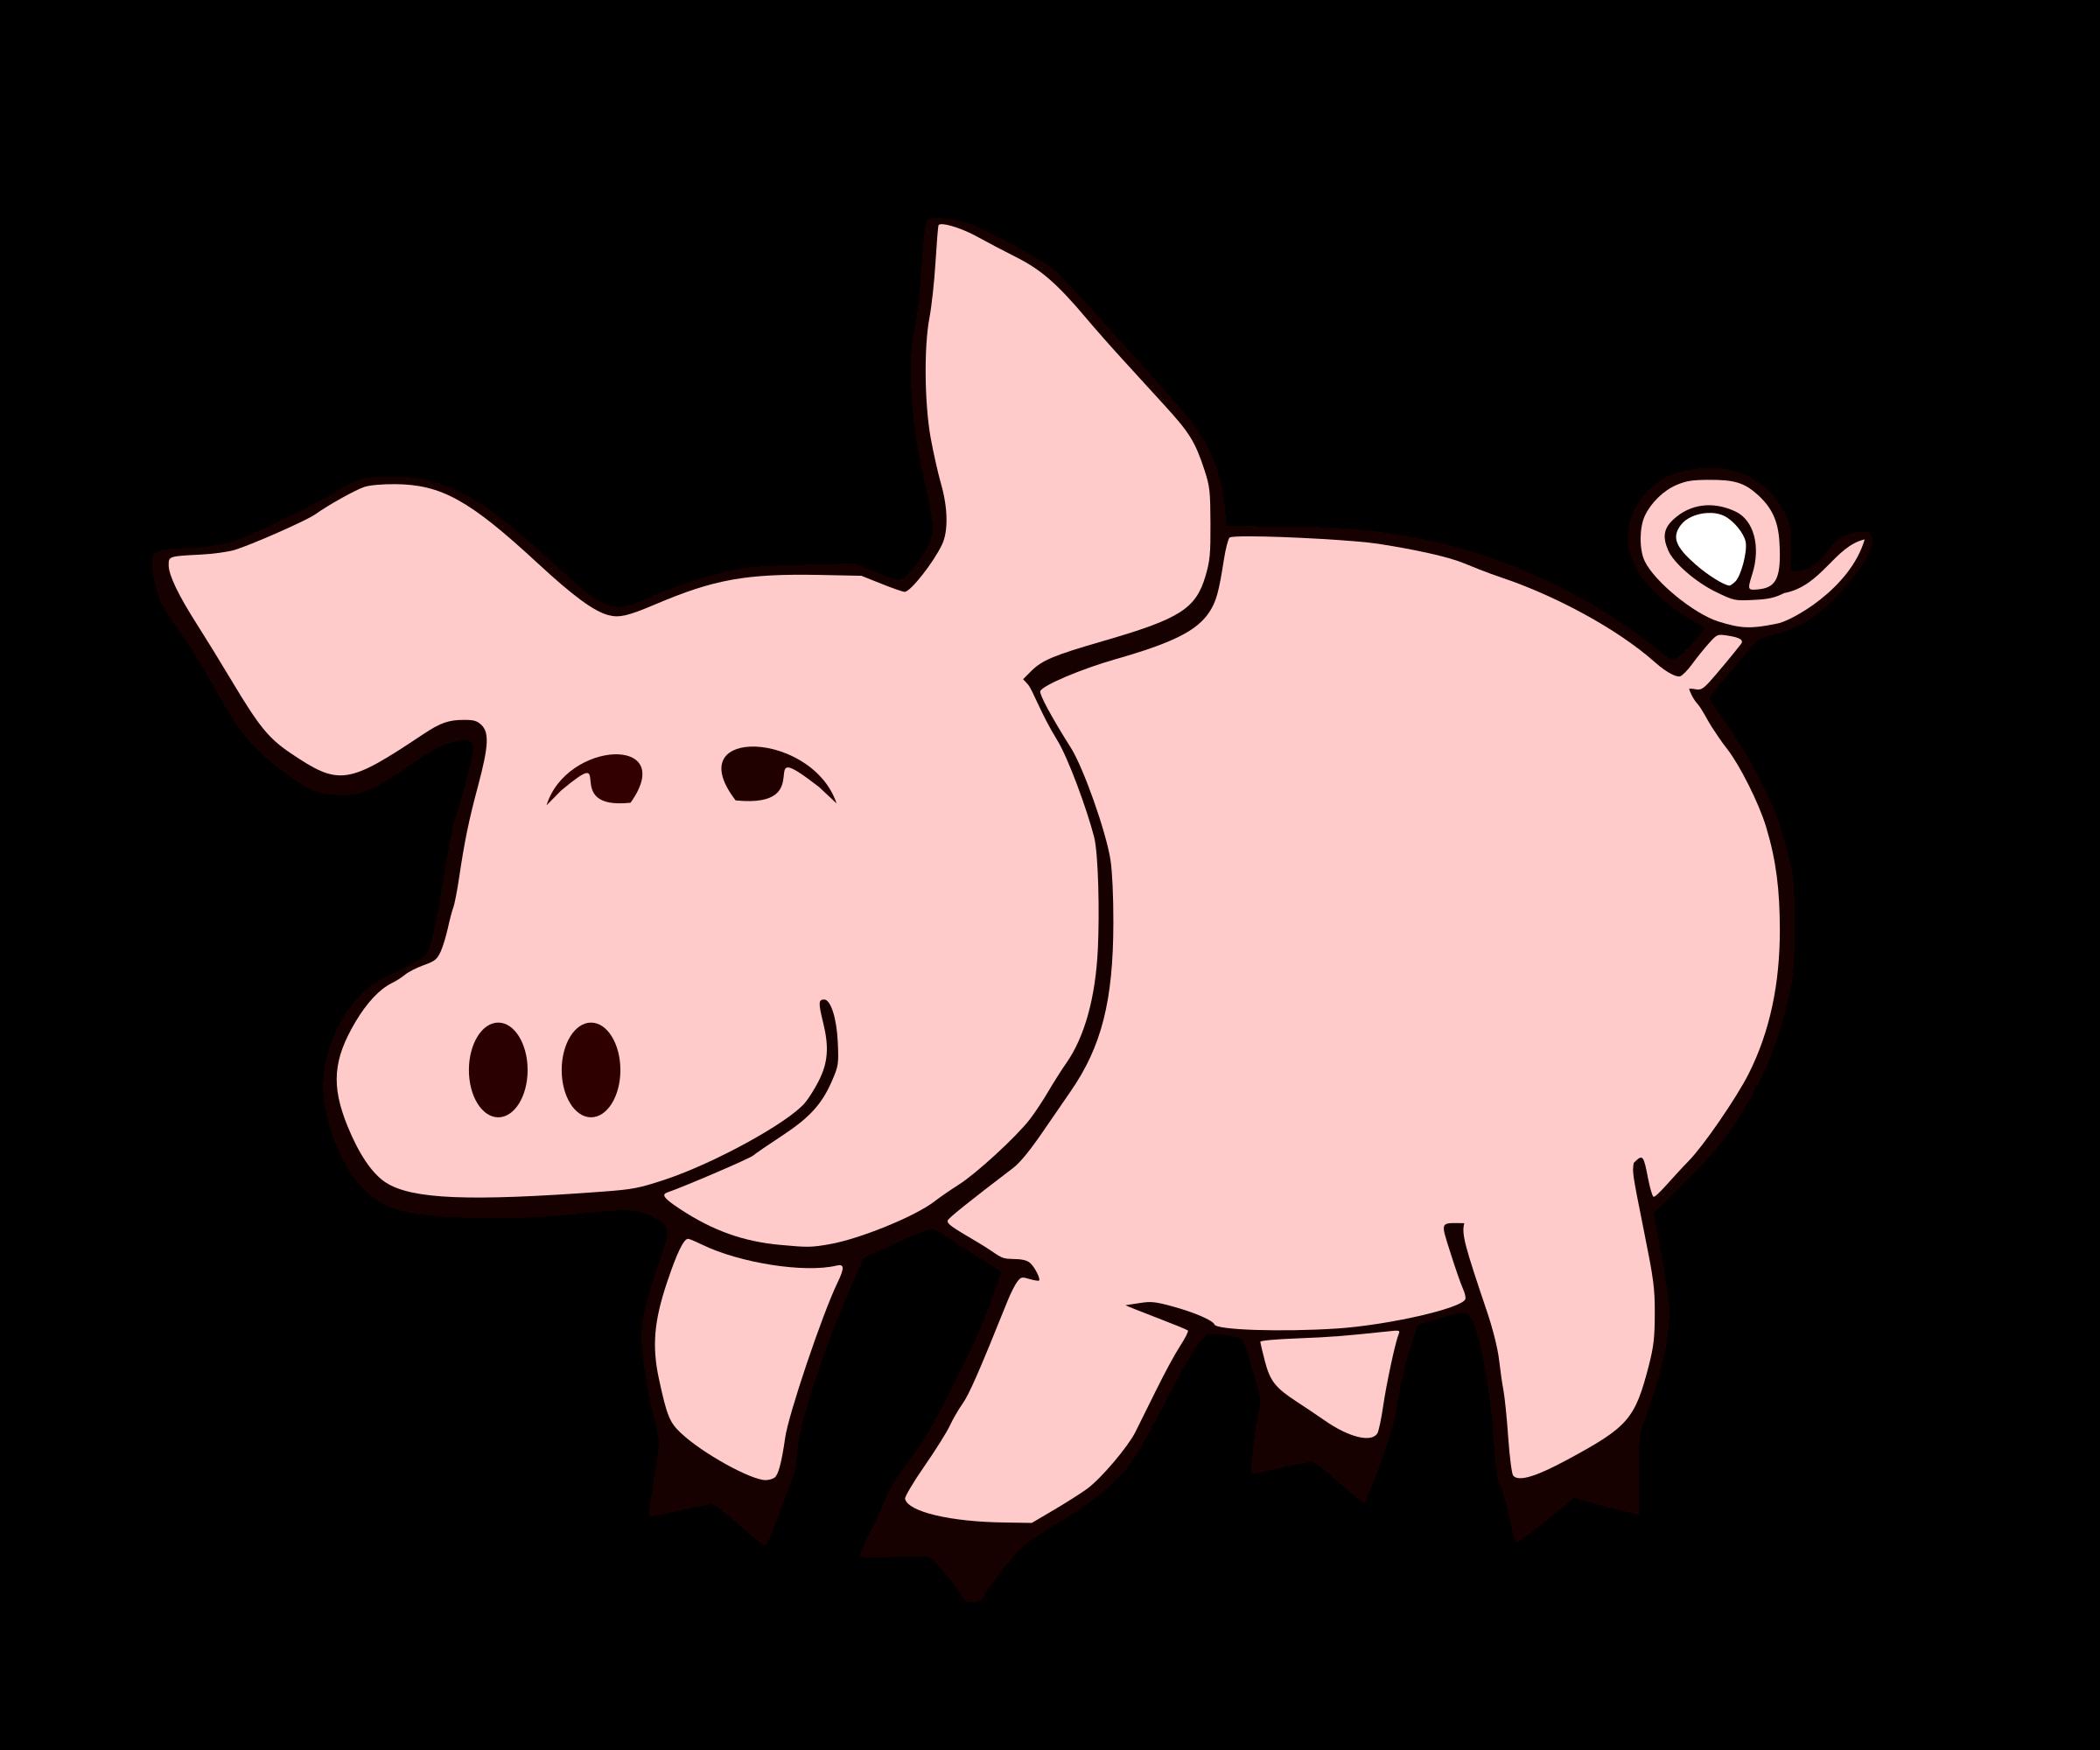 clipart transparent download Clip art of typegoodies. Ham clipart pig